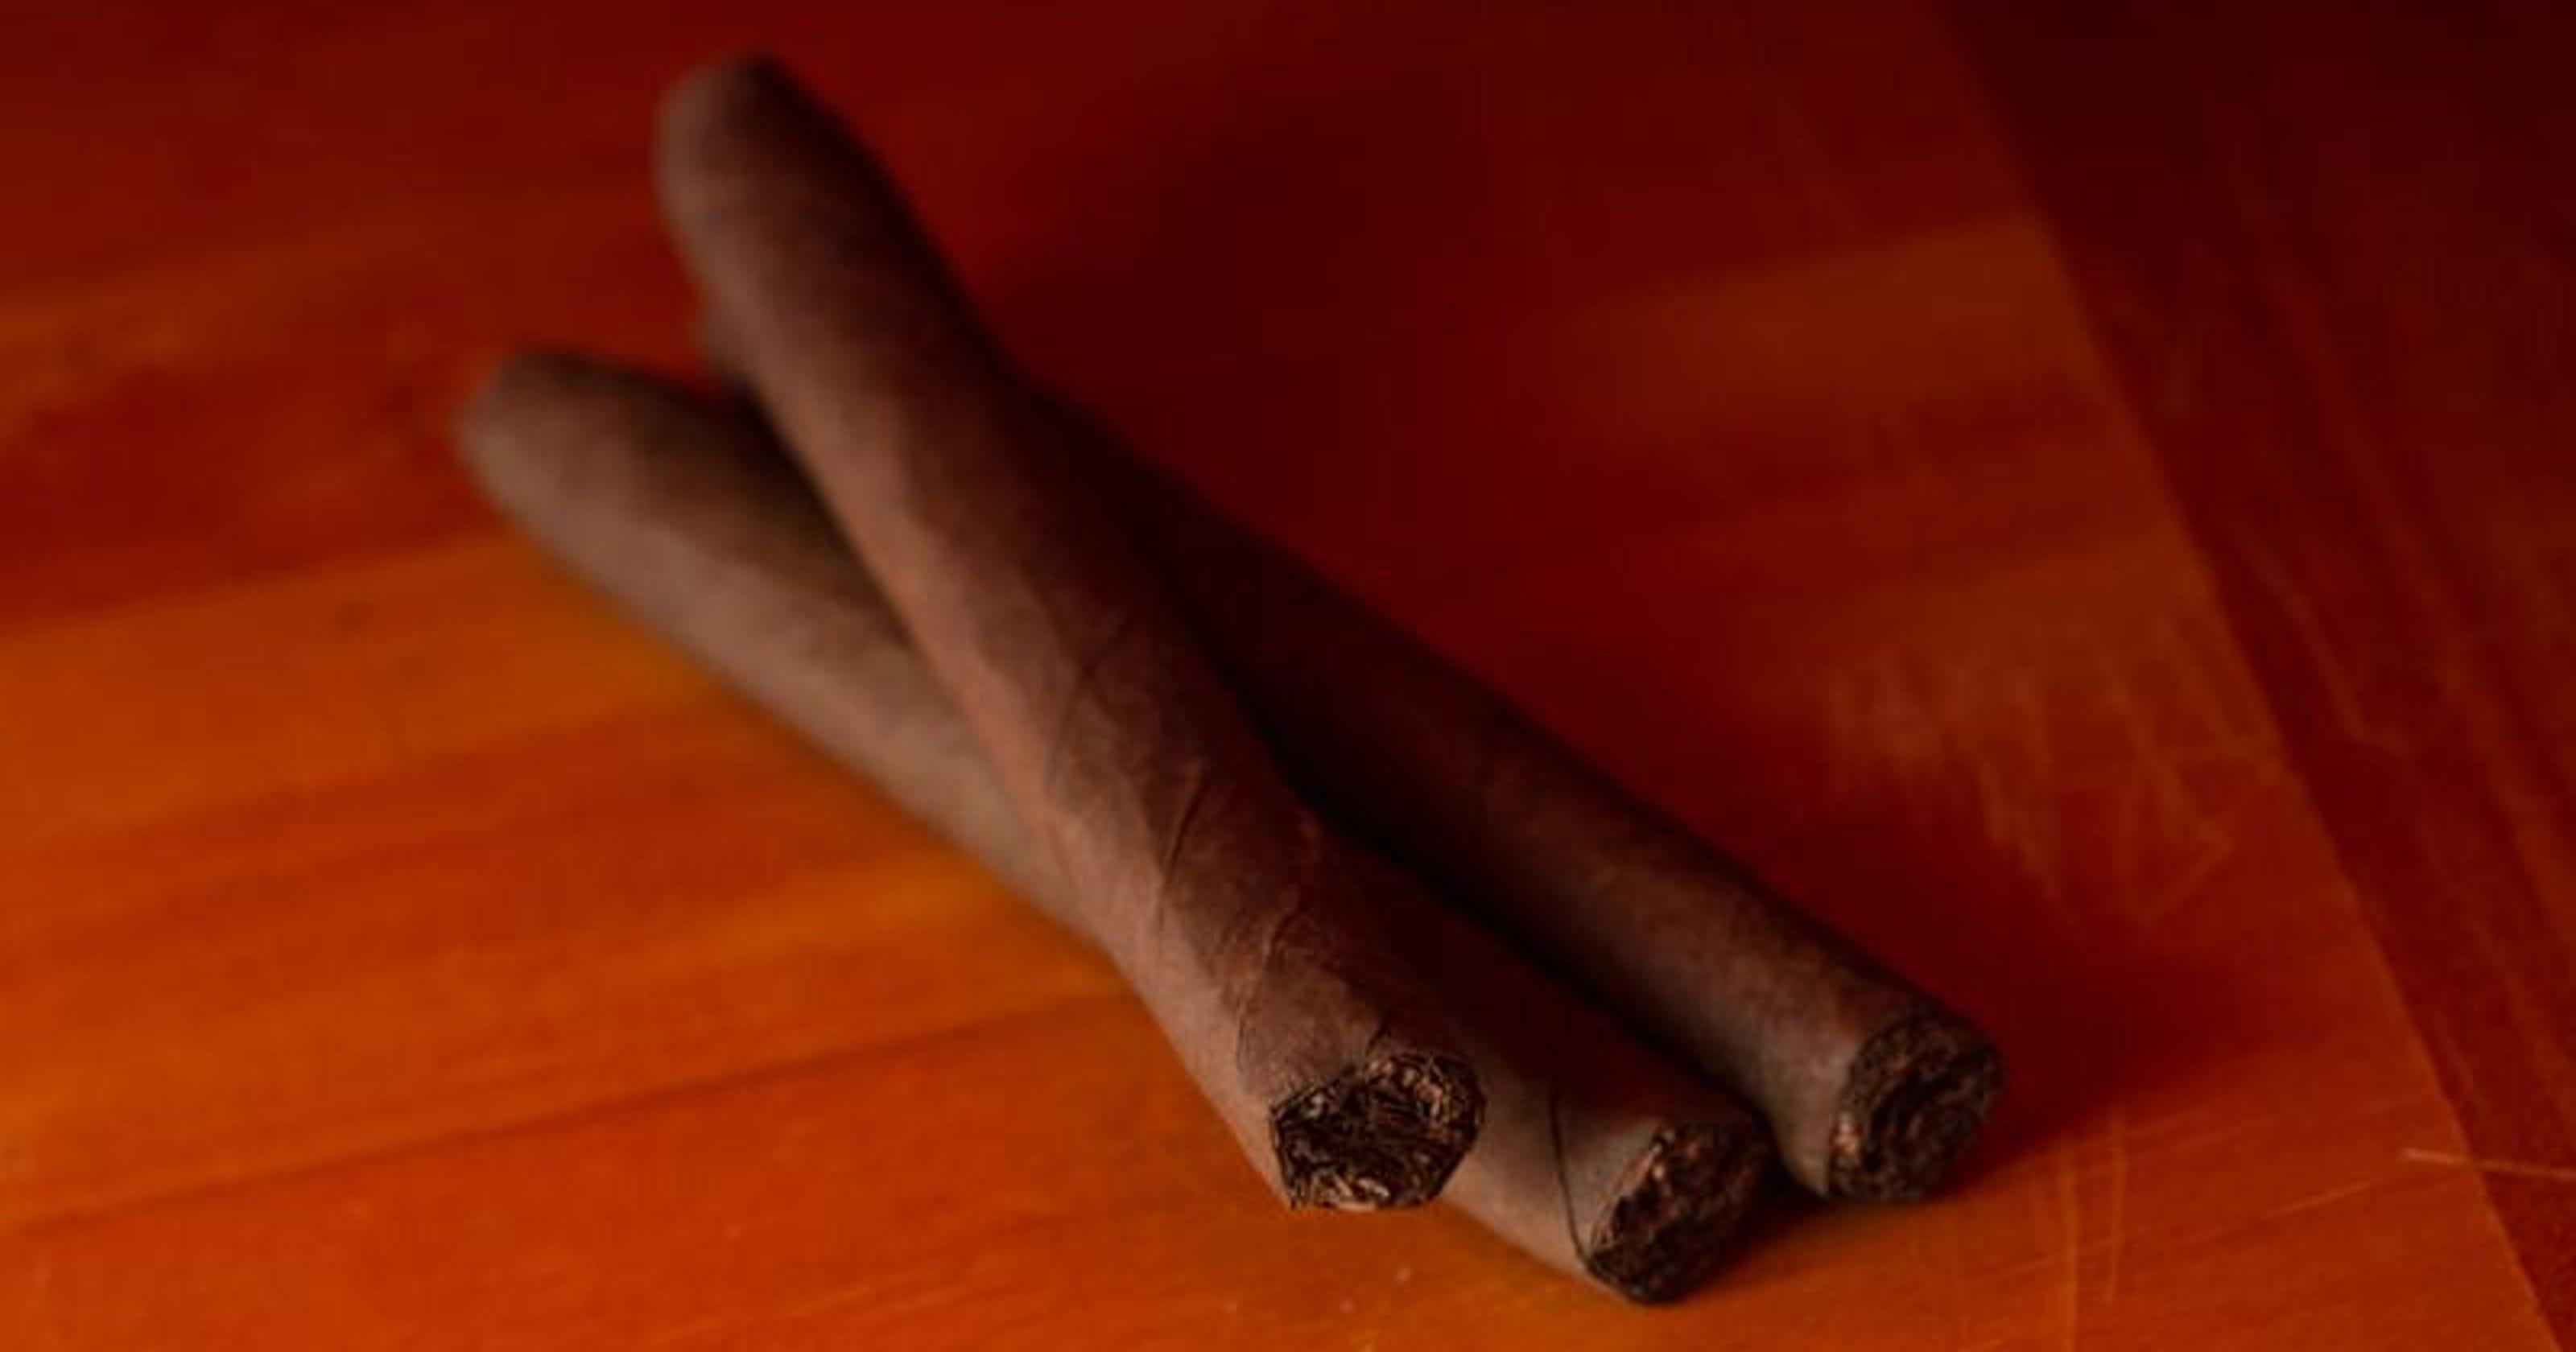 Appeals court: 'Blunt' is not drug paraphernalia